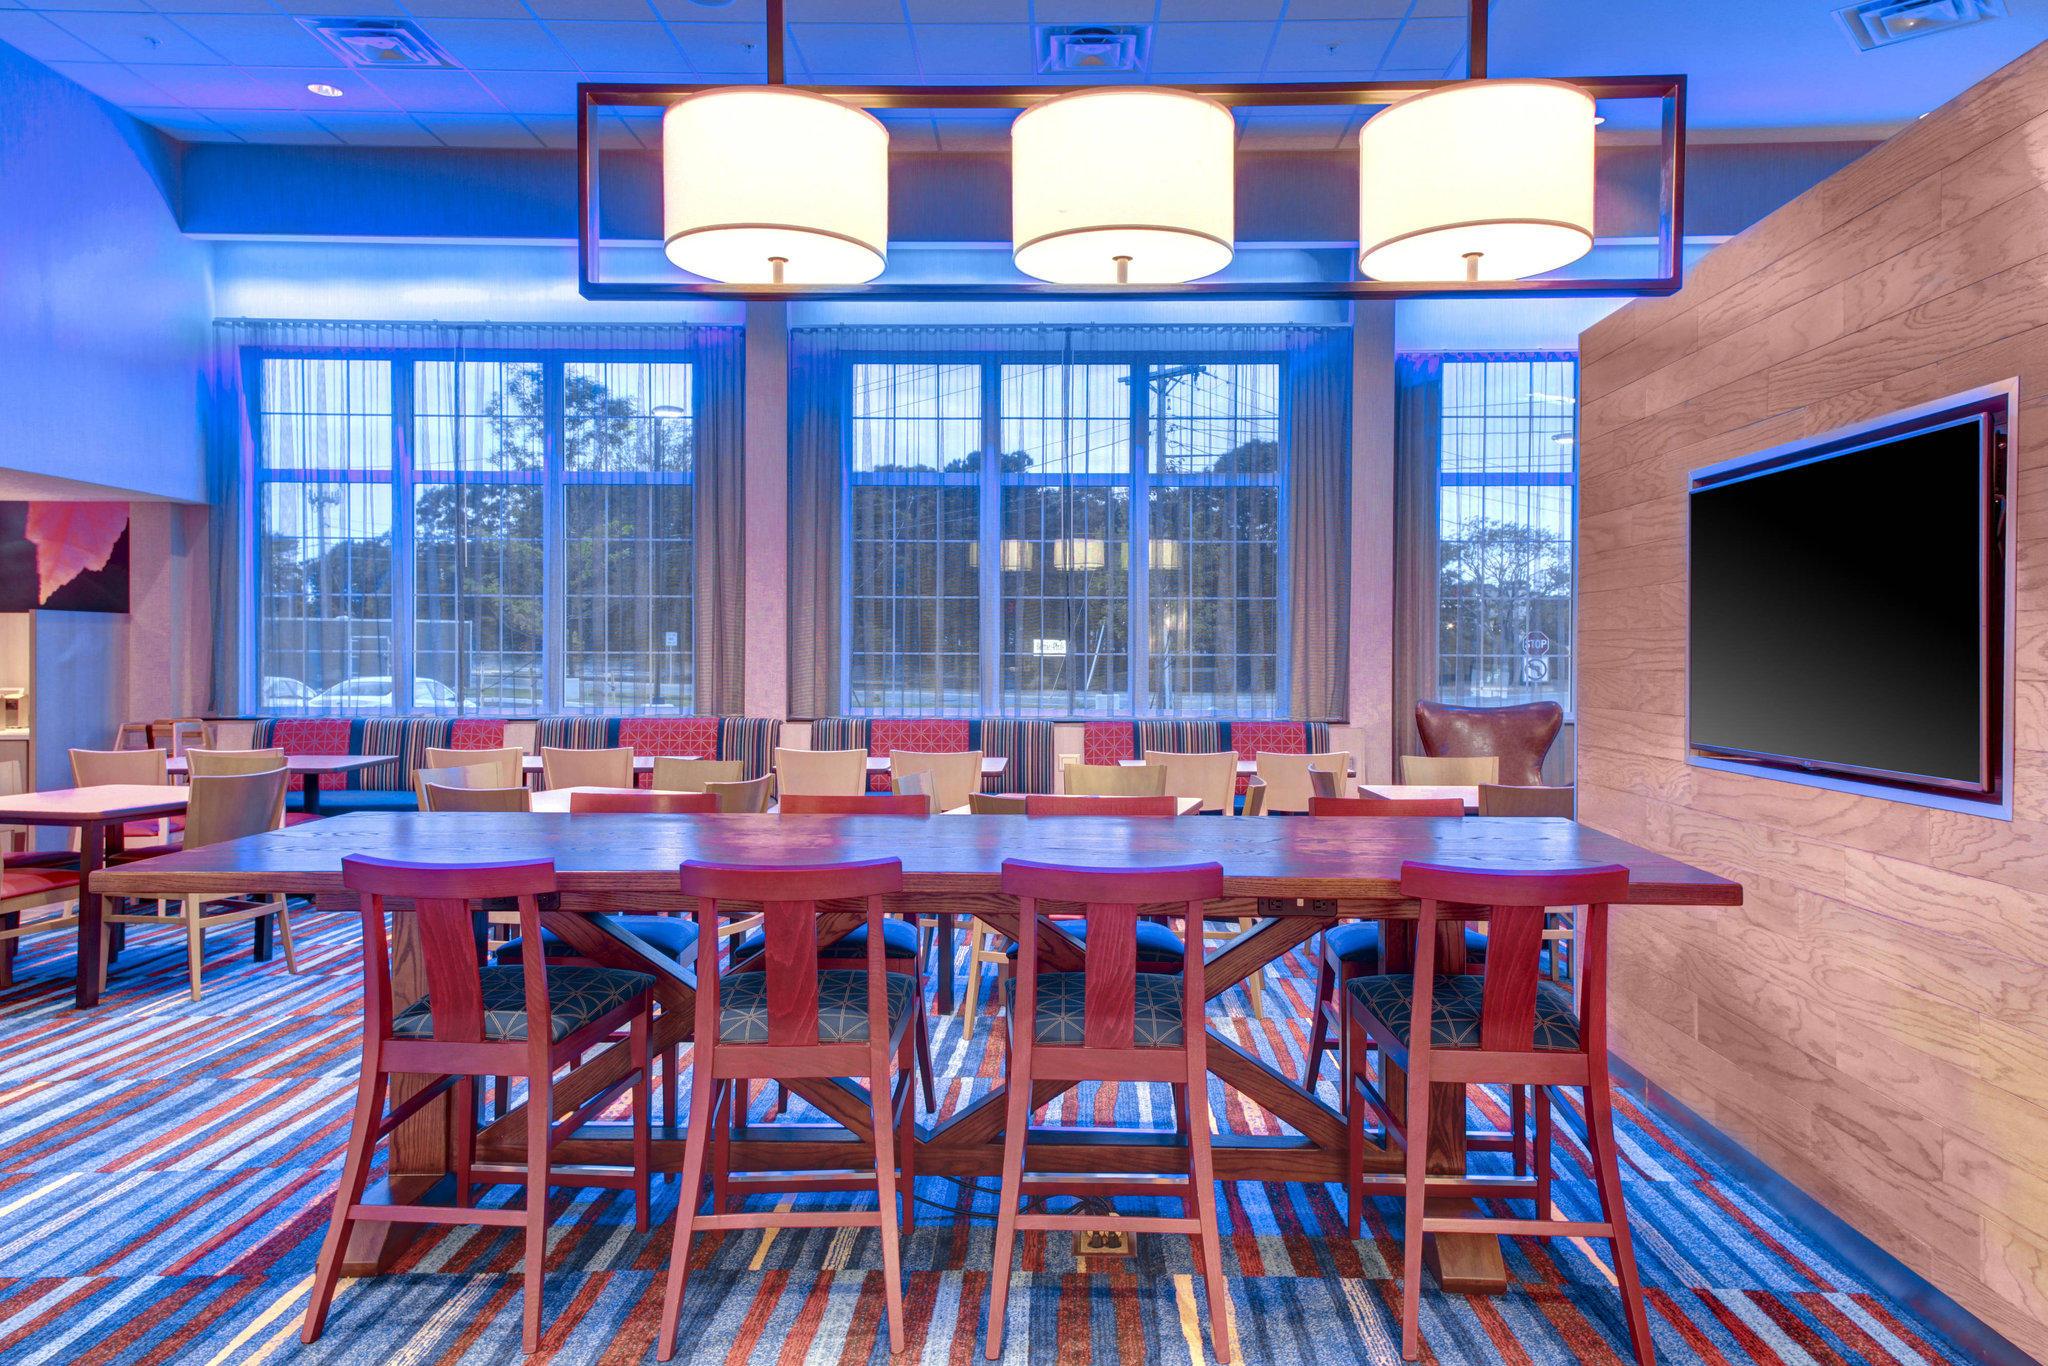 Fairfield Inn & Suites by Marriott Cape Cod Hyannis